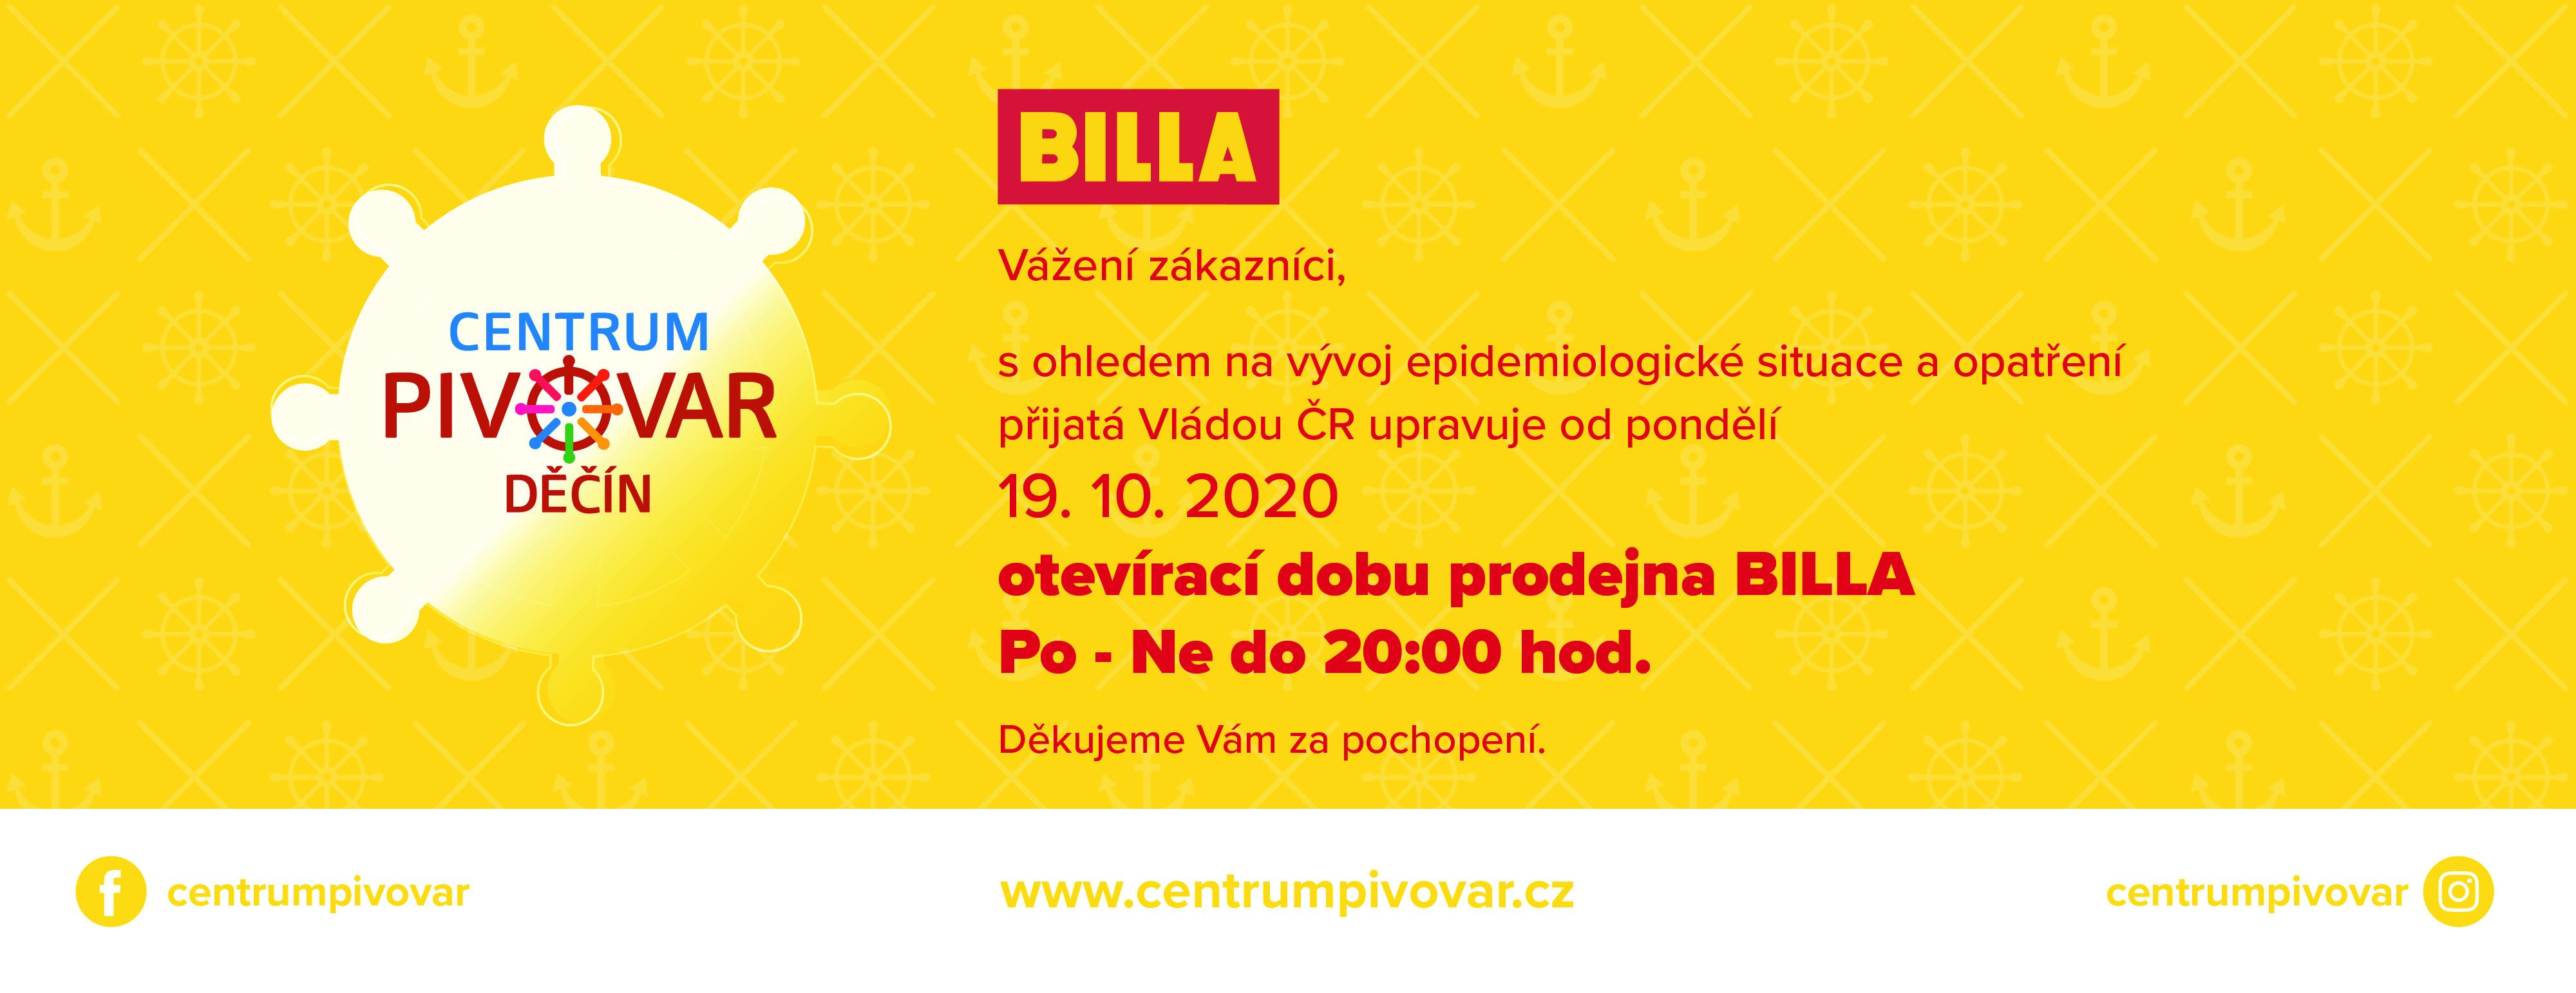 ocp-banner-billa-1920x740px.jpg